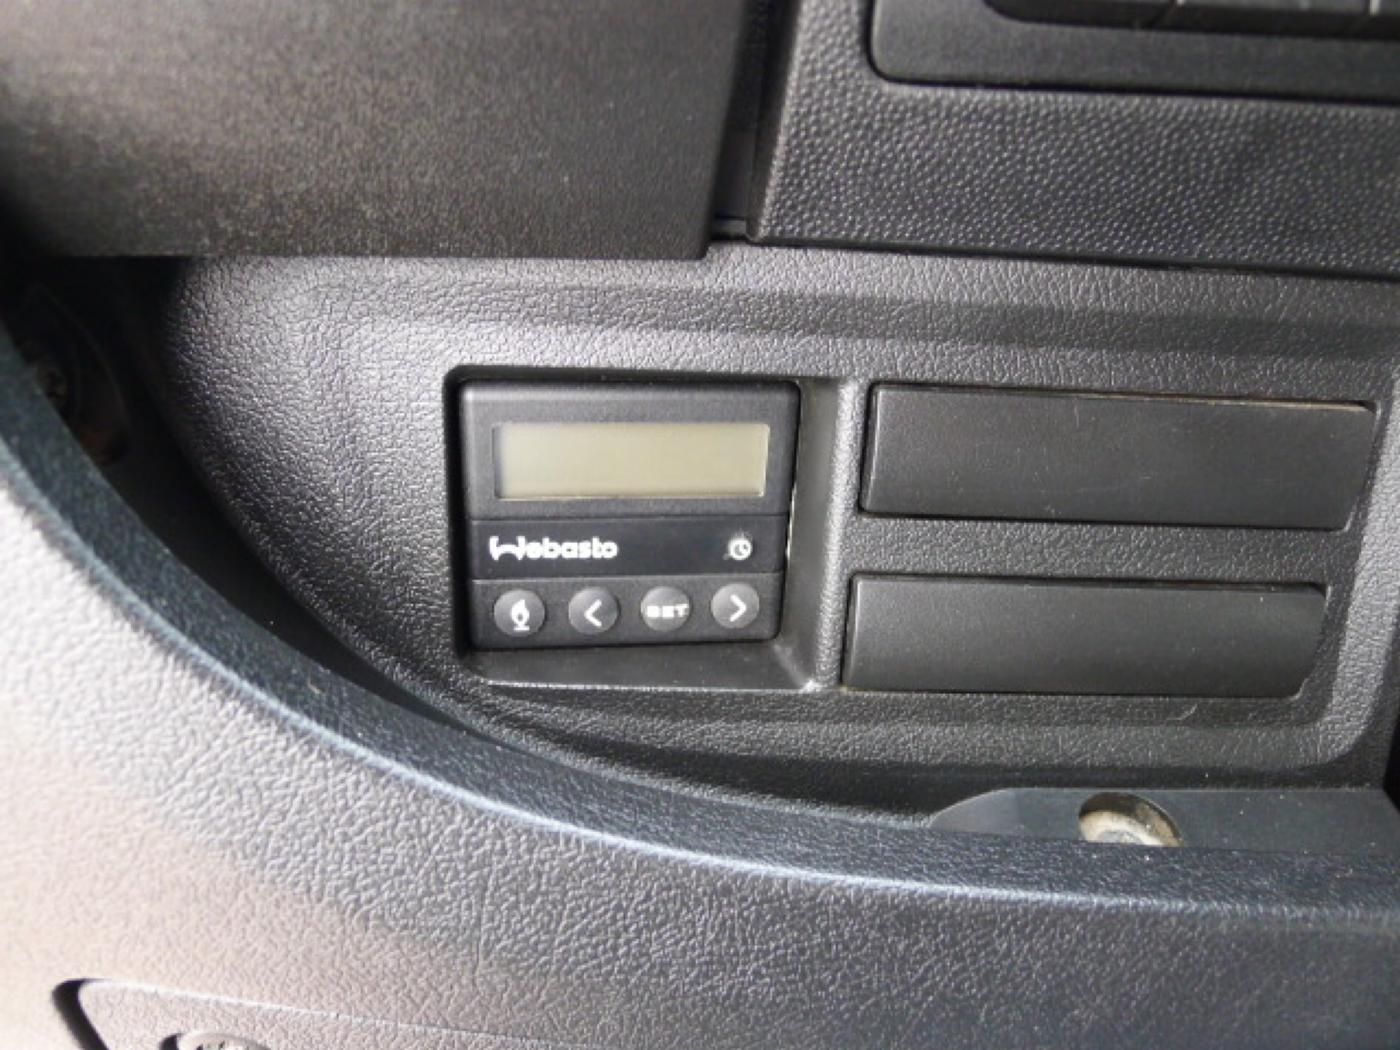 Peugeot Boxer 2,2 HDI PANORAMA 8míst+2 x klima+We - 16